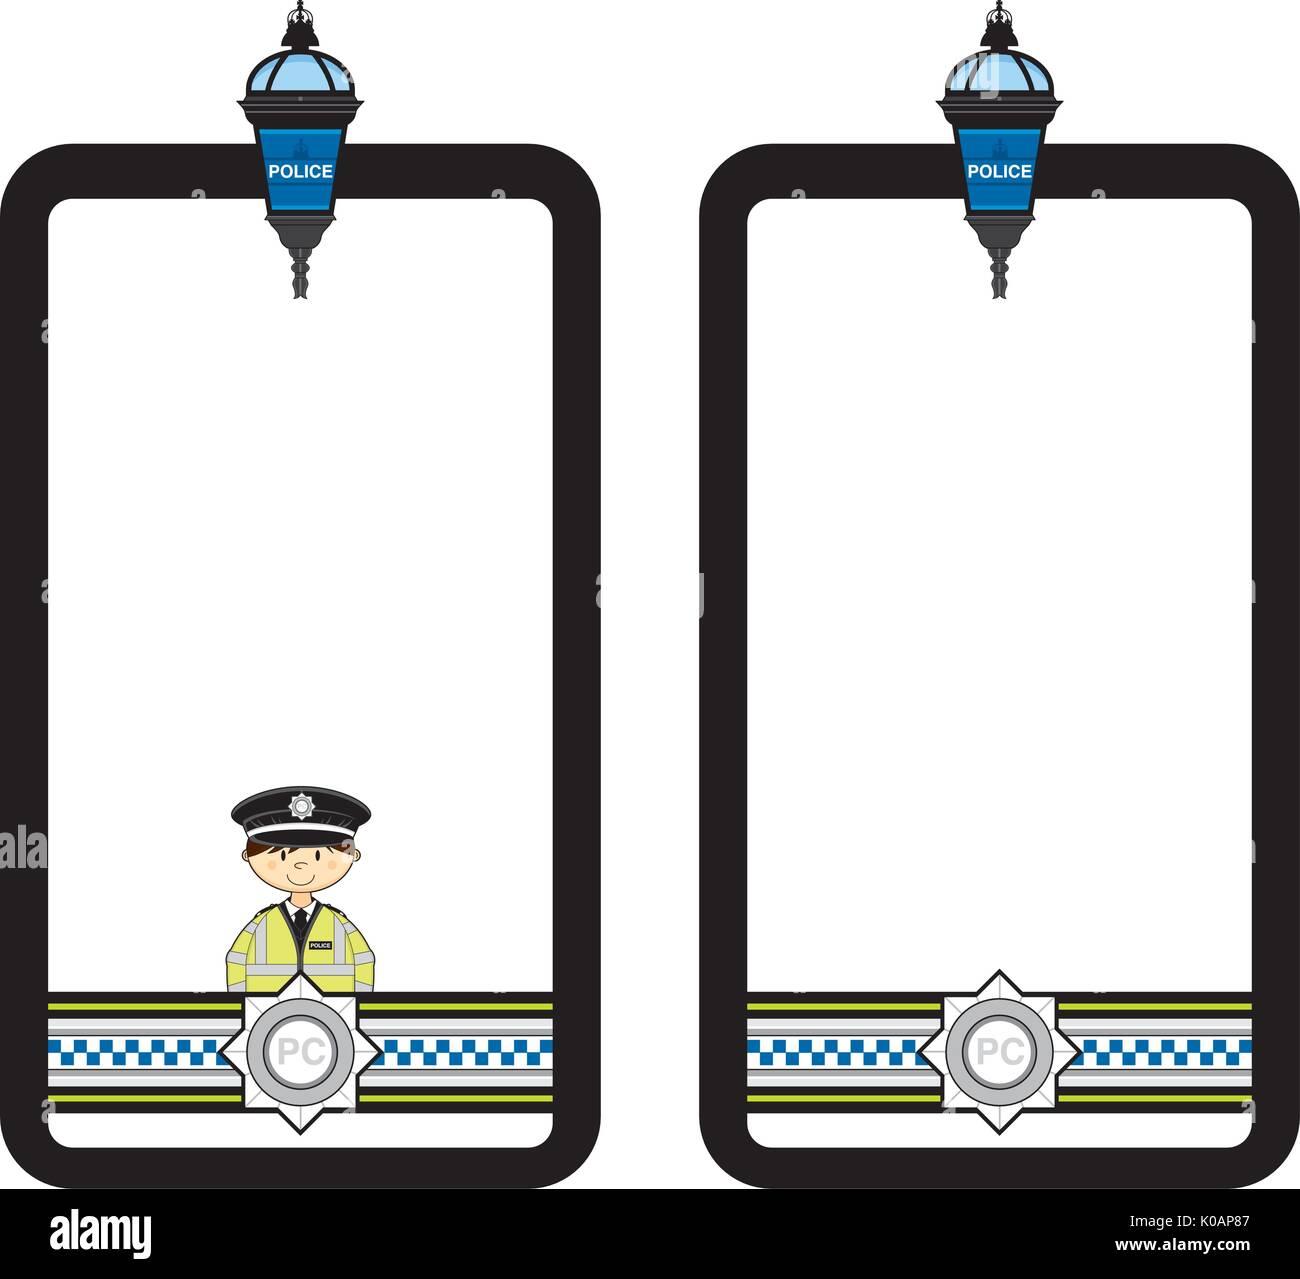 Cute Cartoon British Policeman Vector Illustration - Stock Image